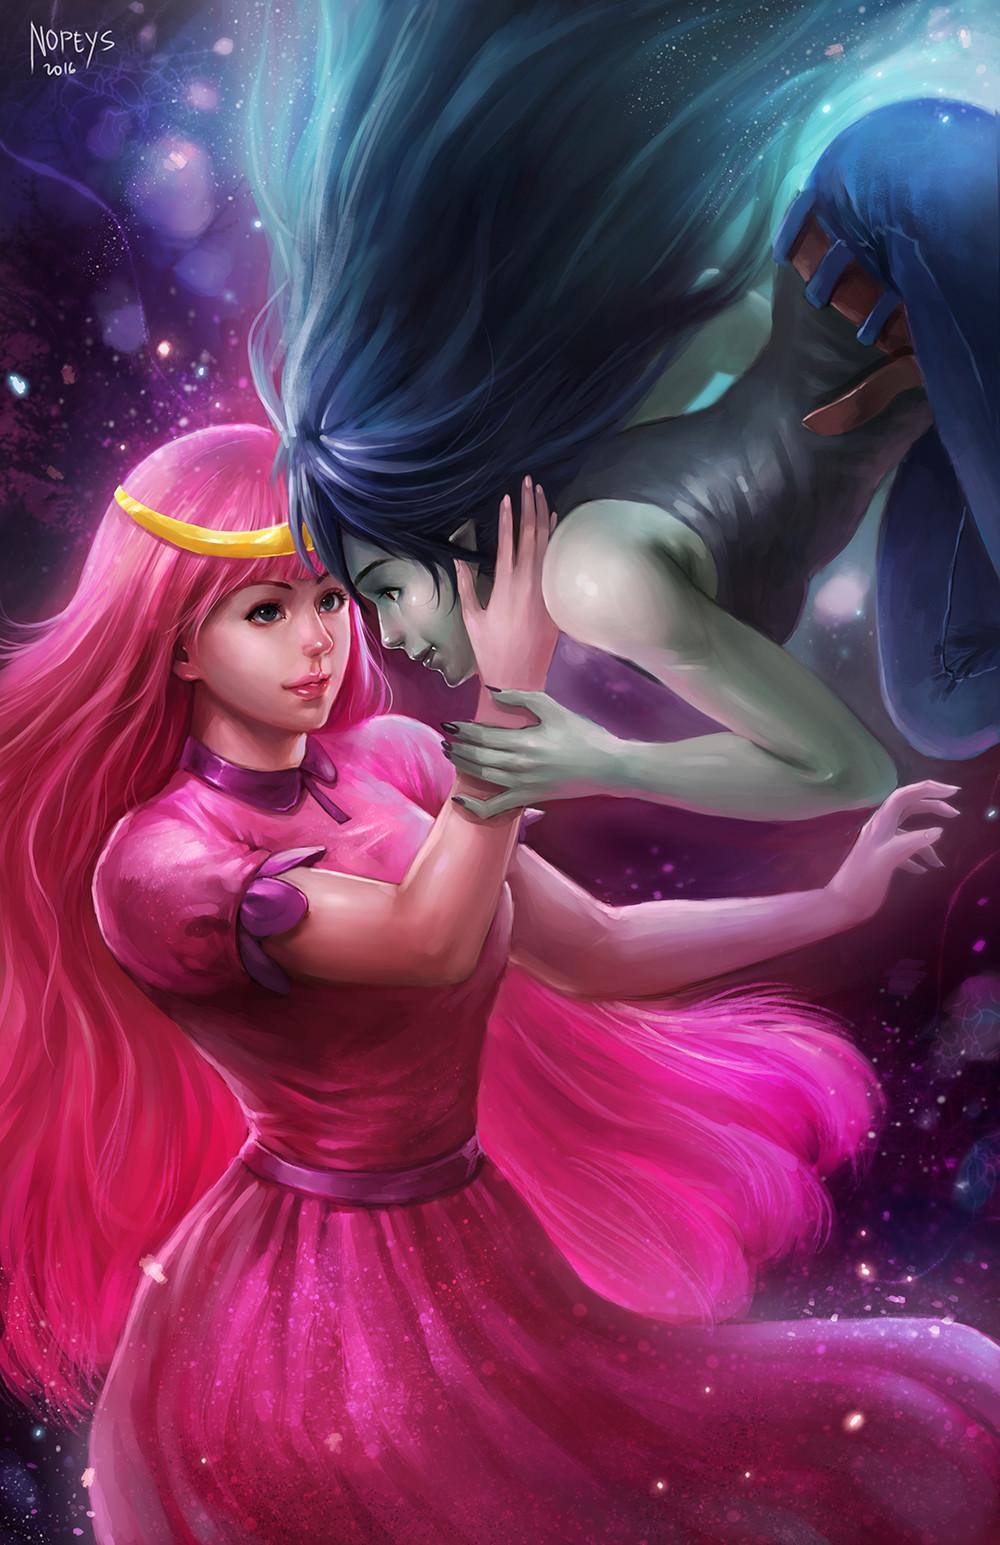 Princess Bubblegum and Marceline